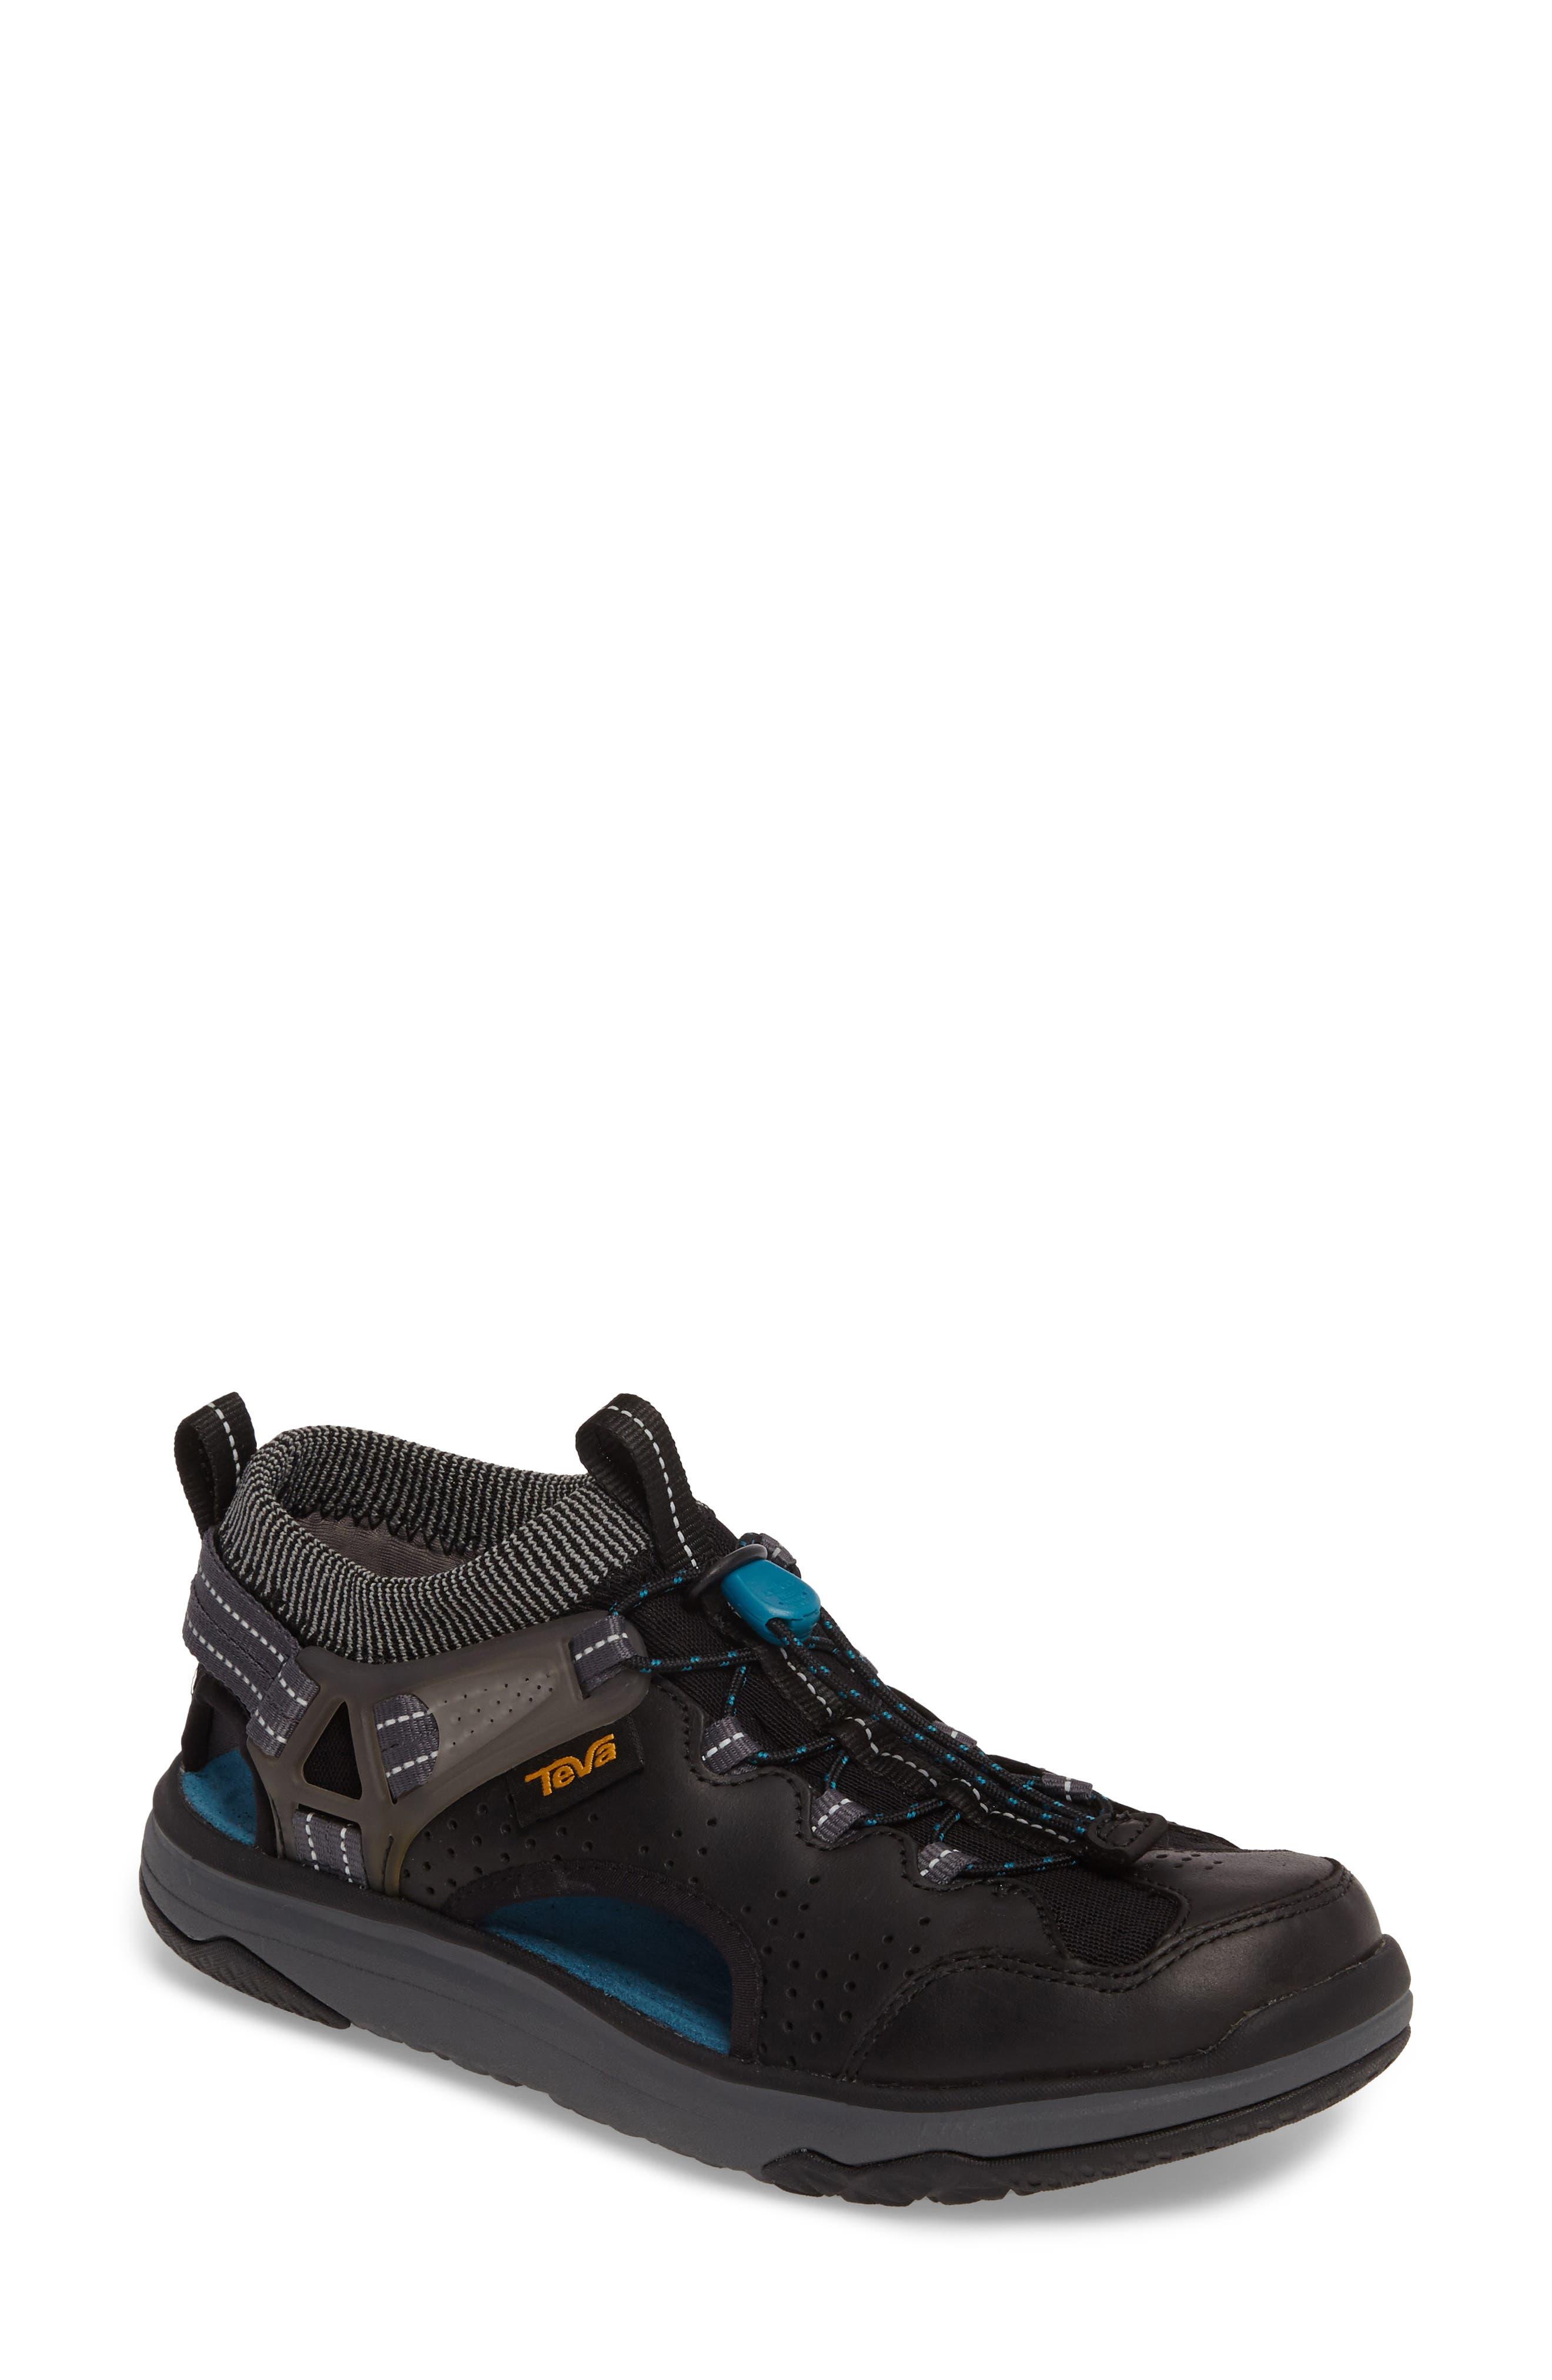 Terra Float Travel Sandal,                         Main,                         color, Black Leather